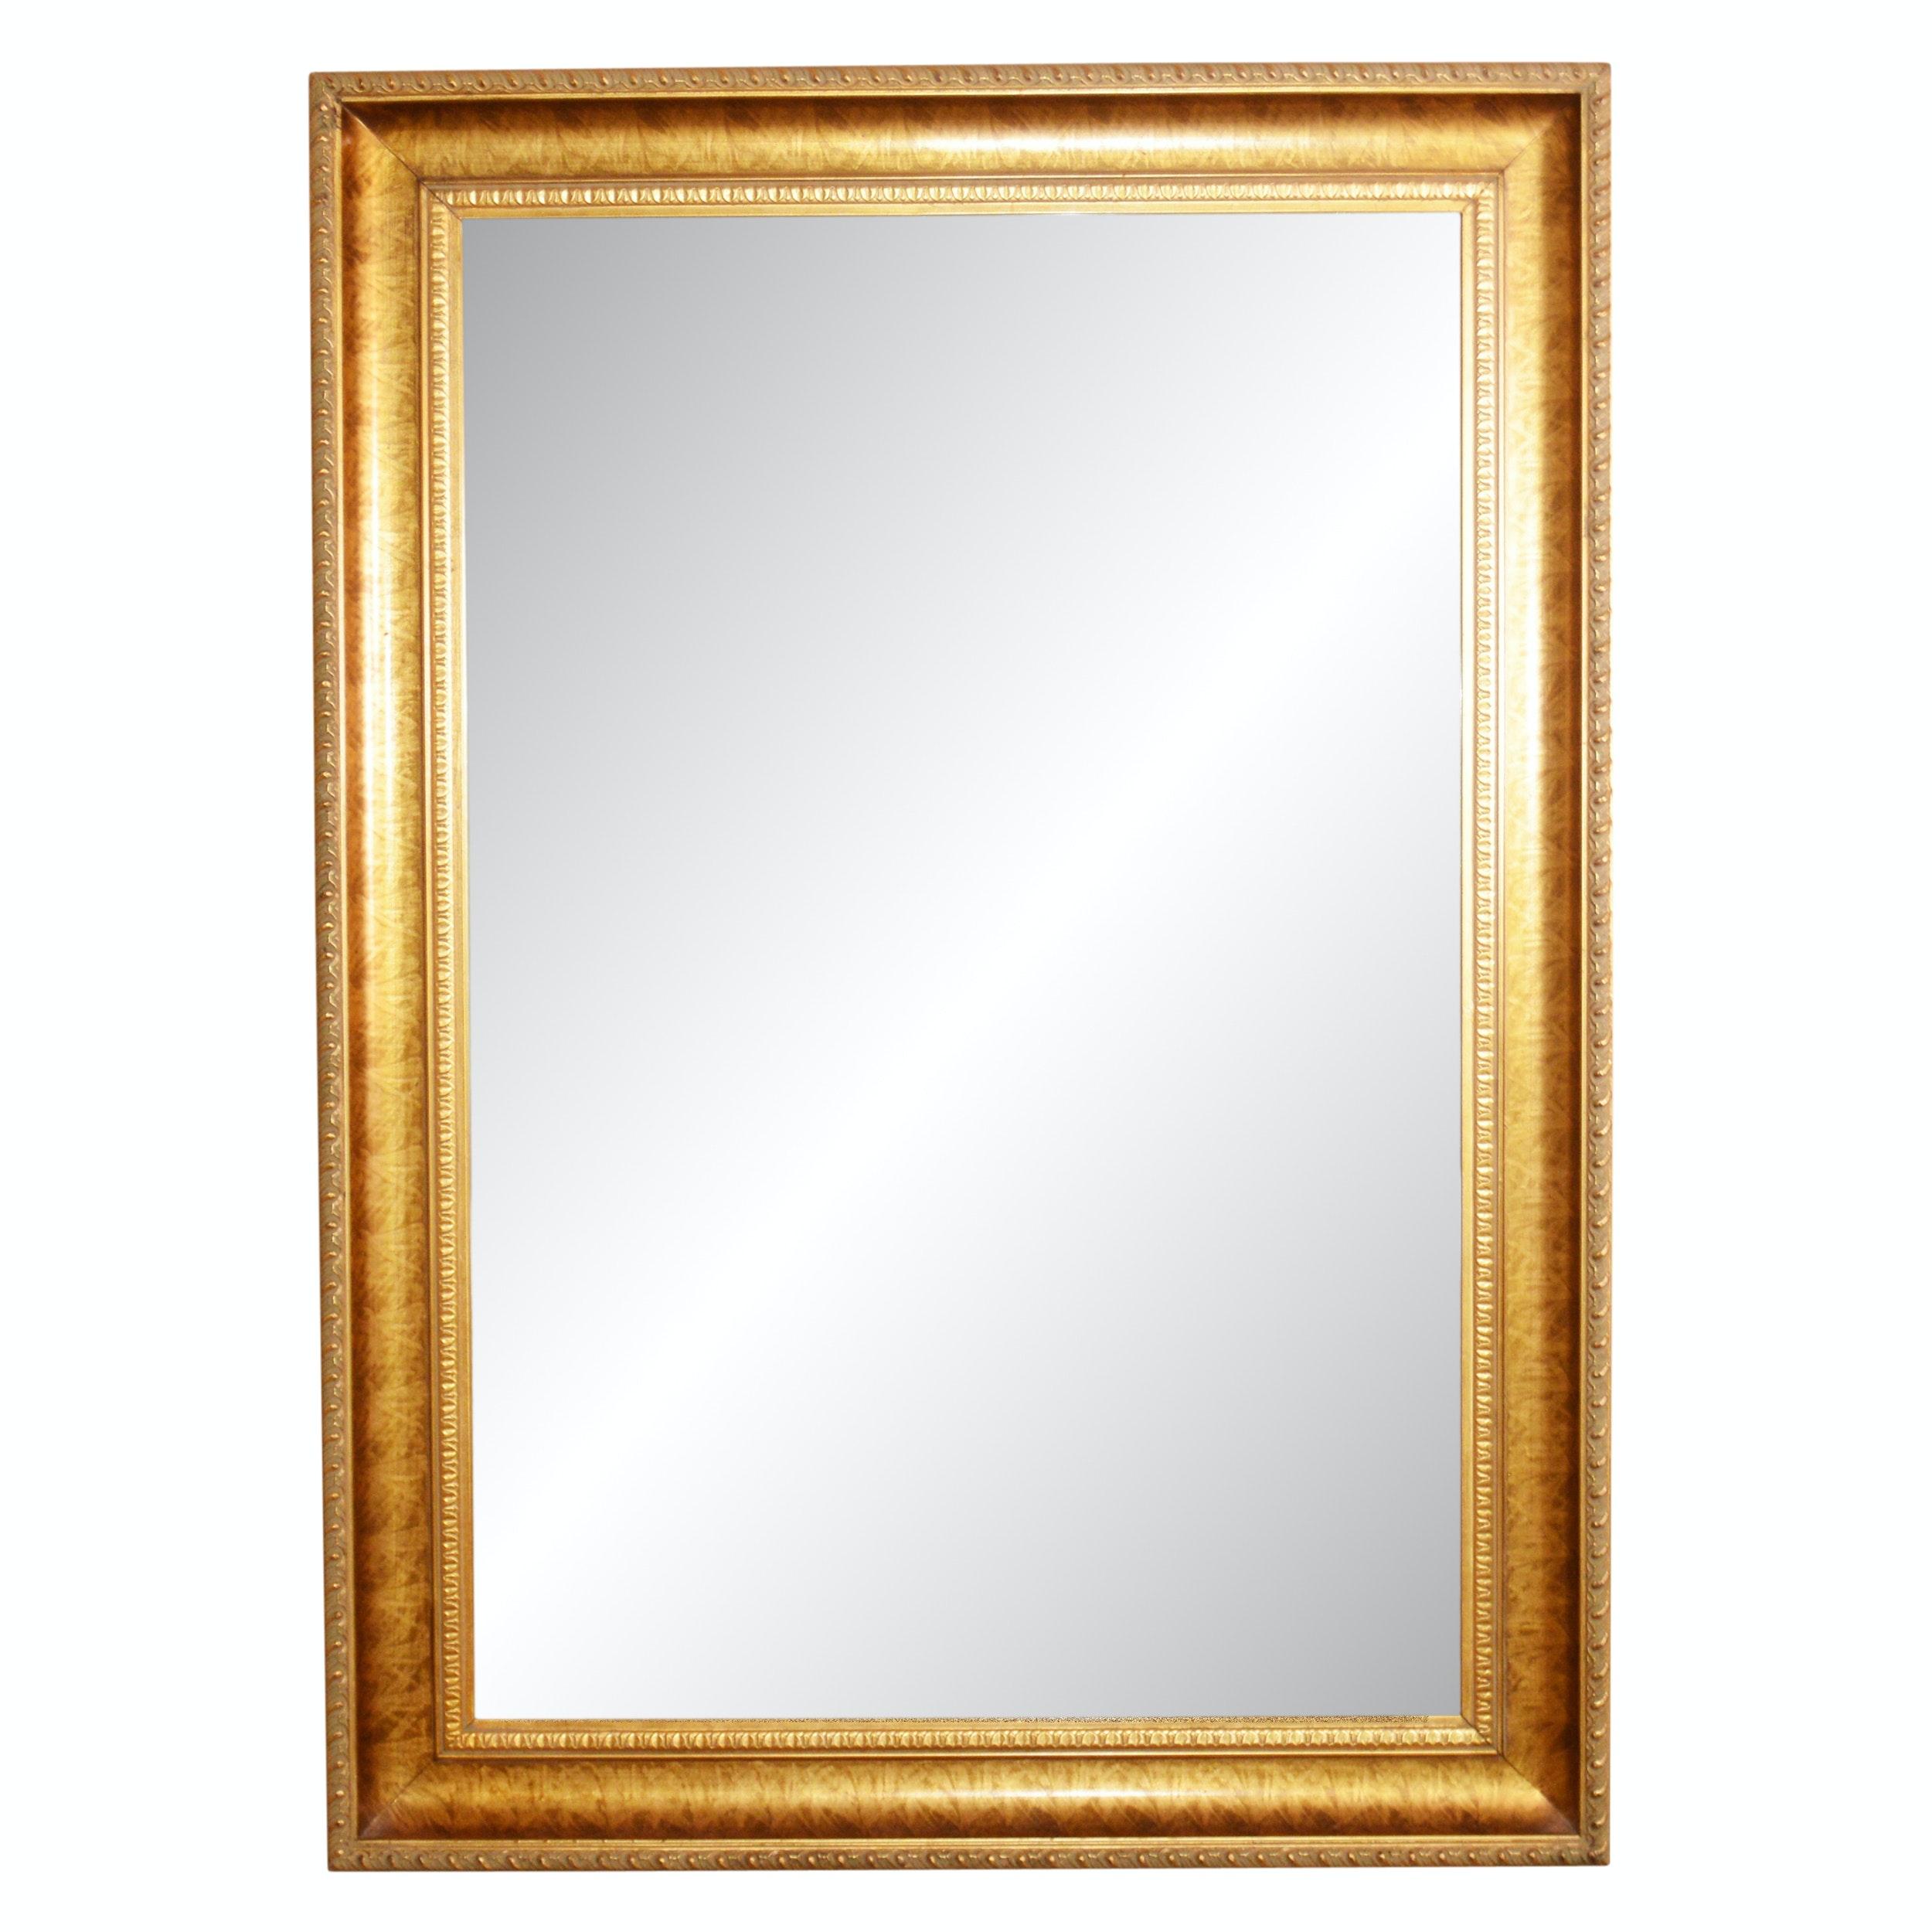 Rectangular Beveled Glass Wall Mirror